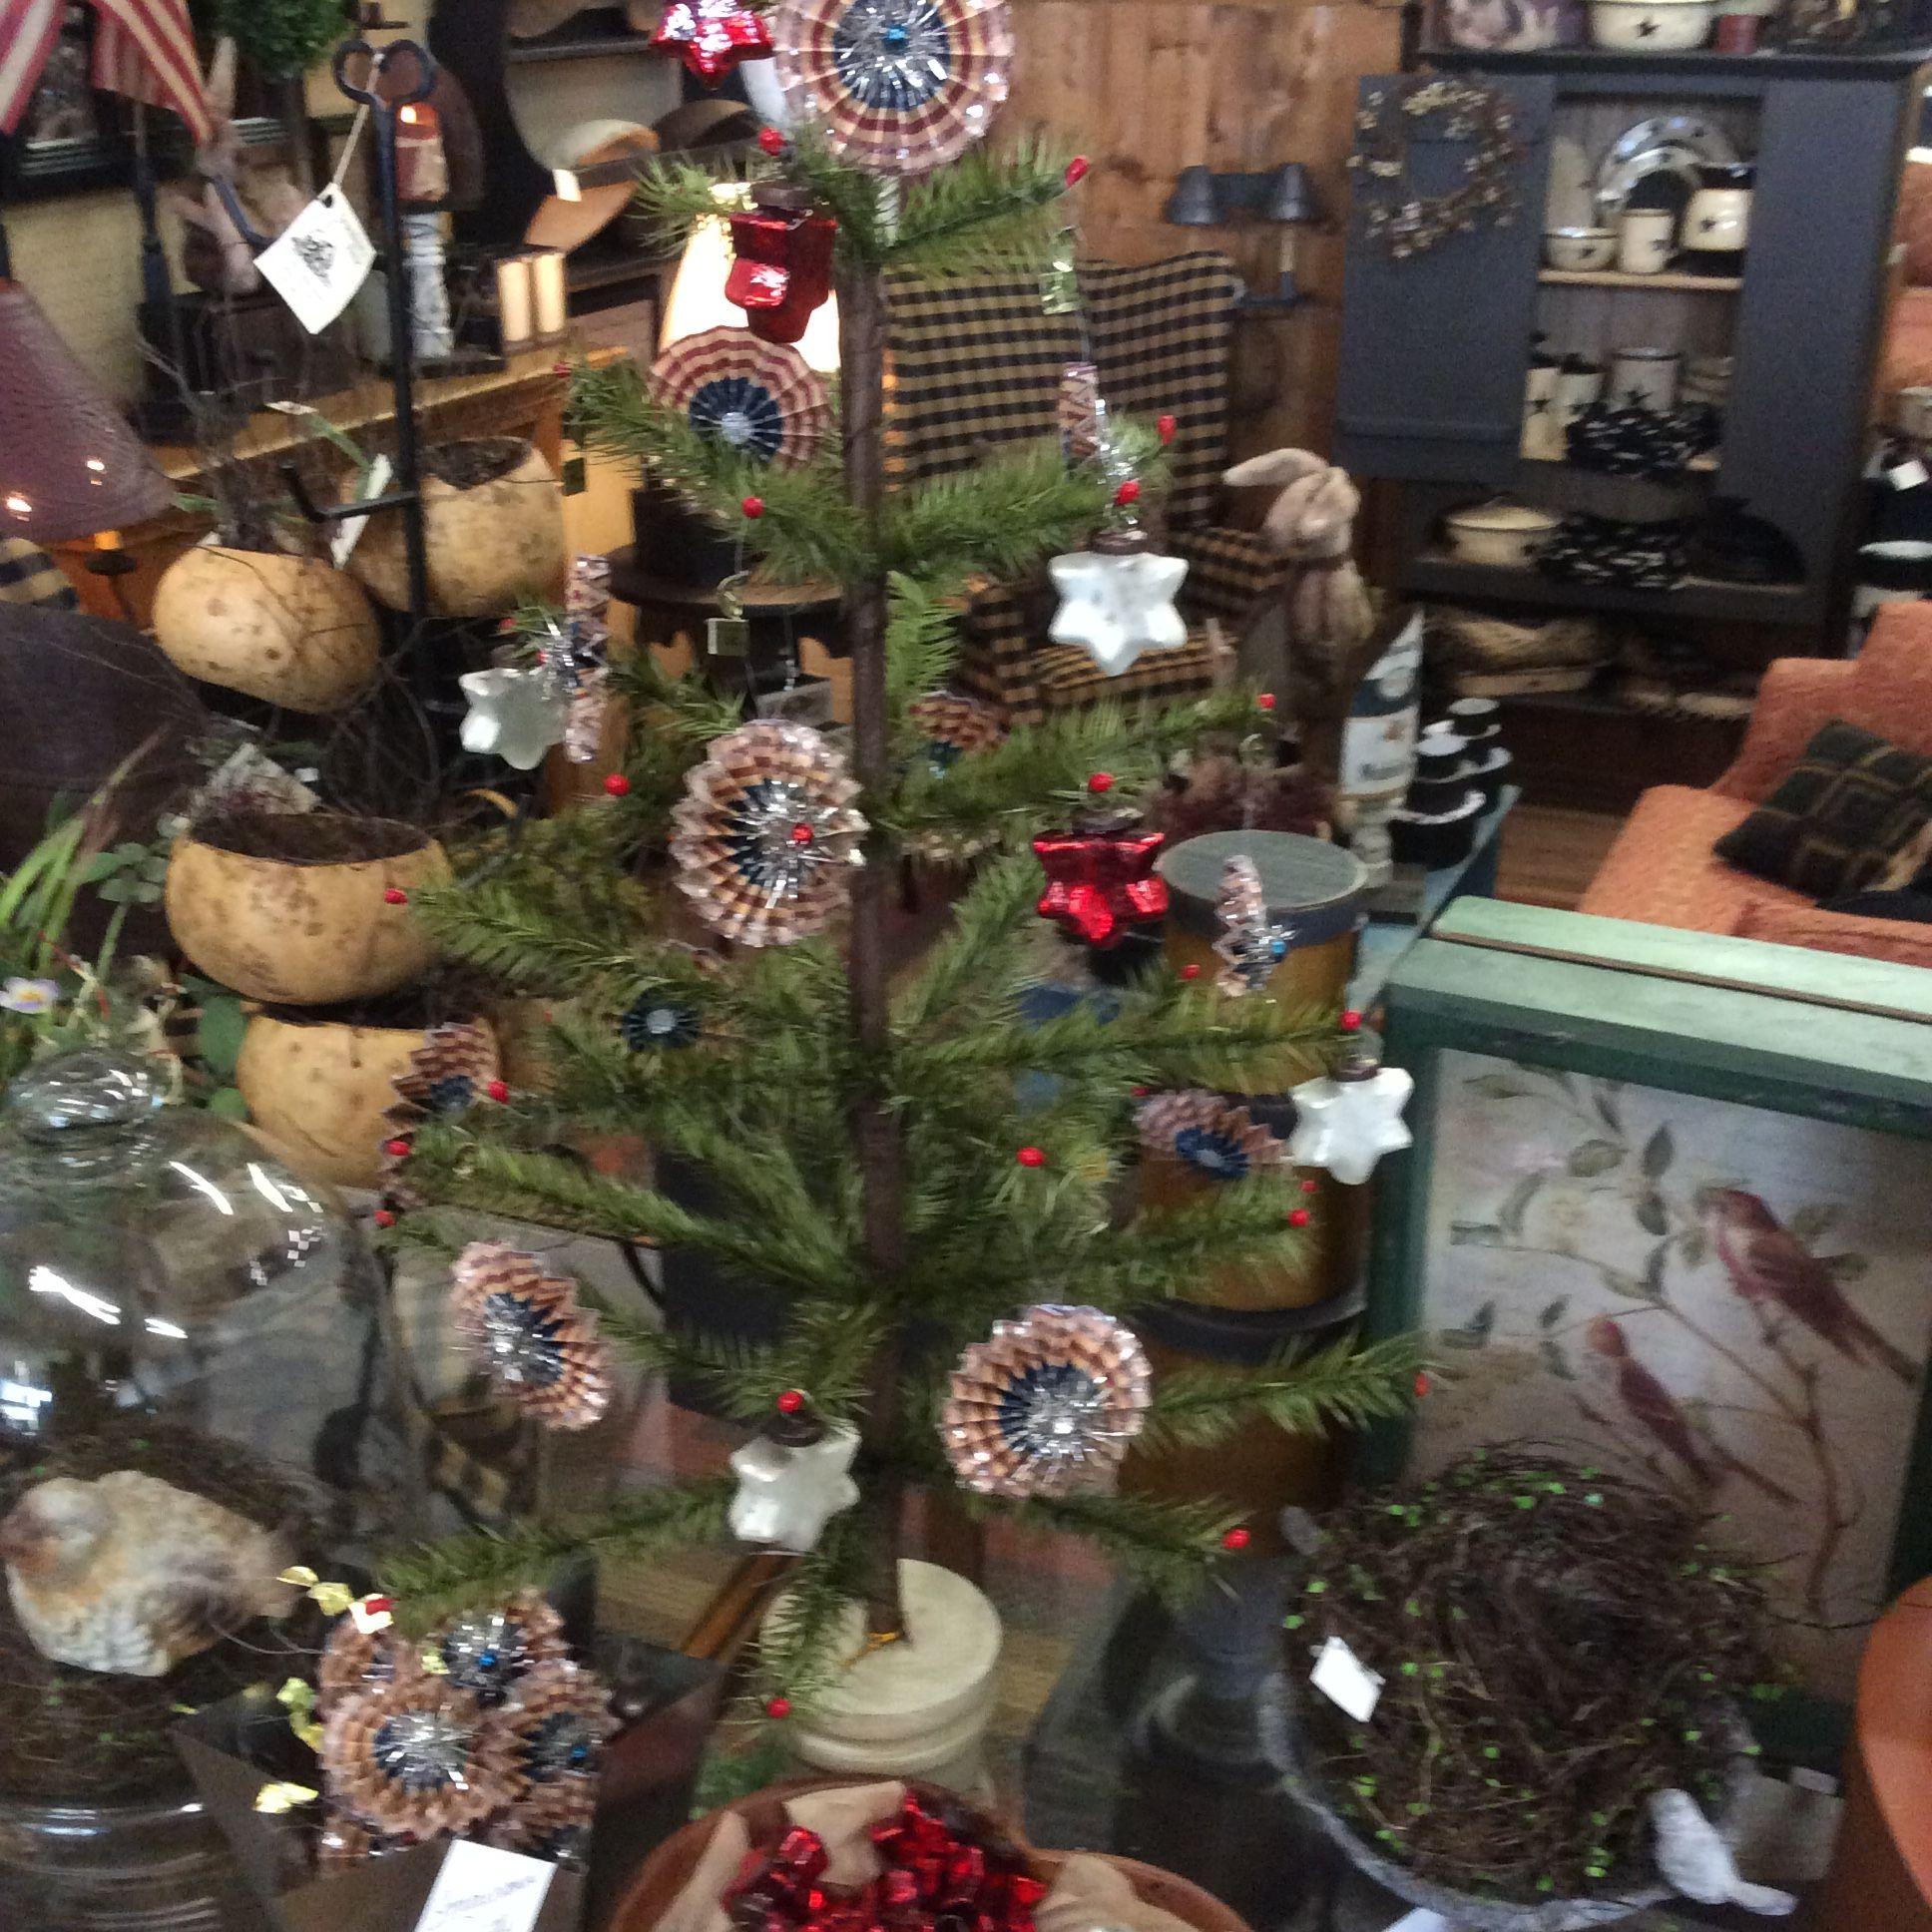 Pin by Sally Nunley on Grandma's Attic Christmas wreaths